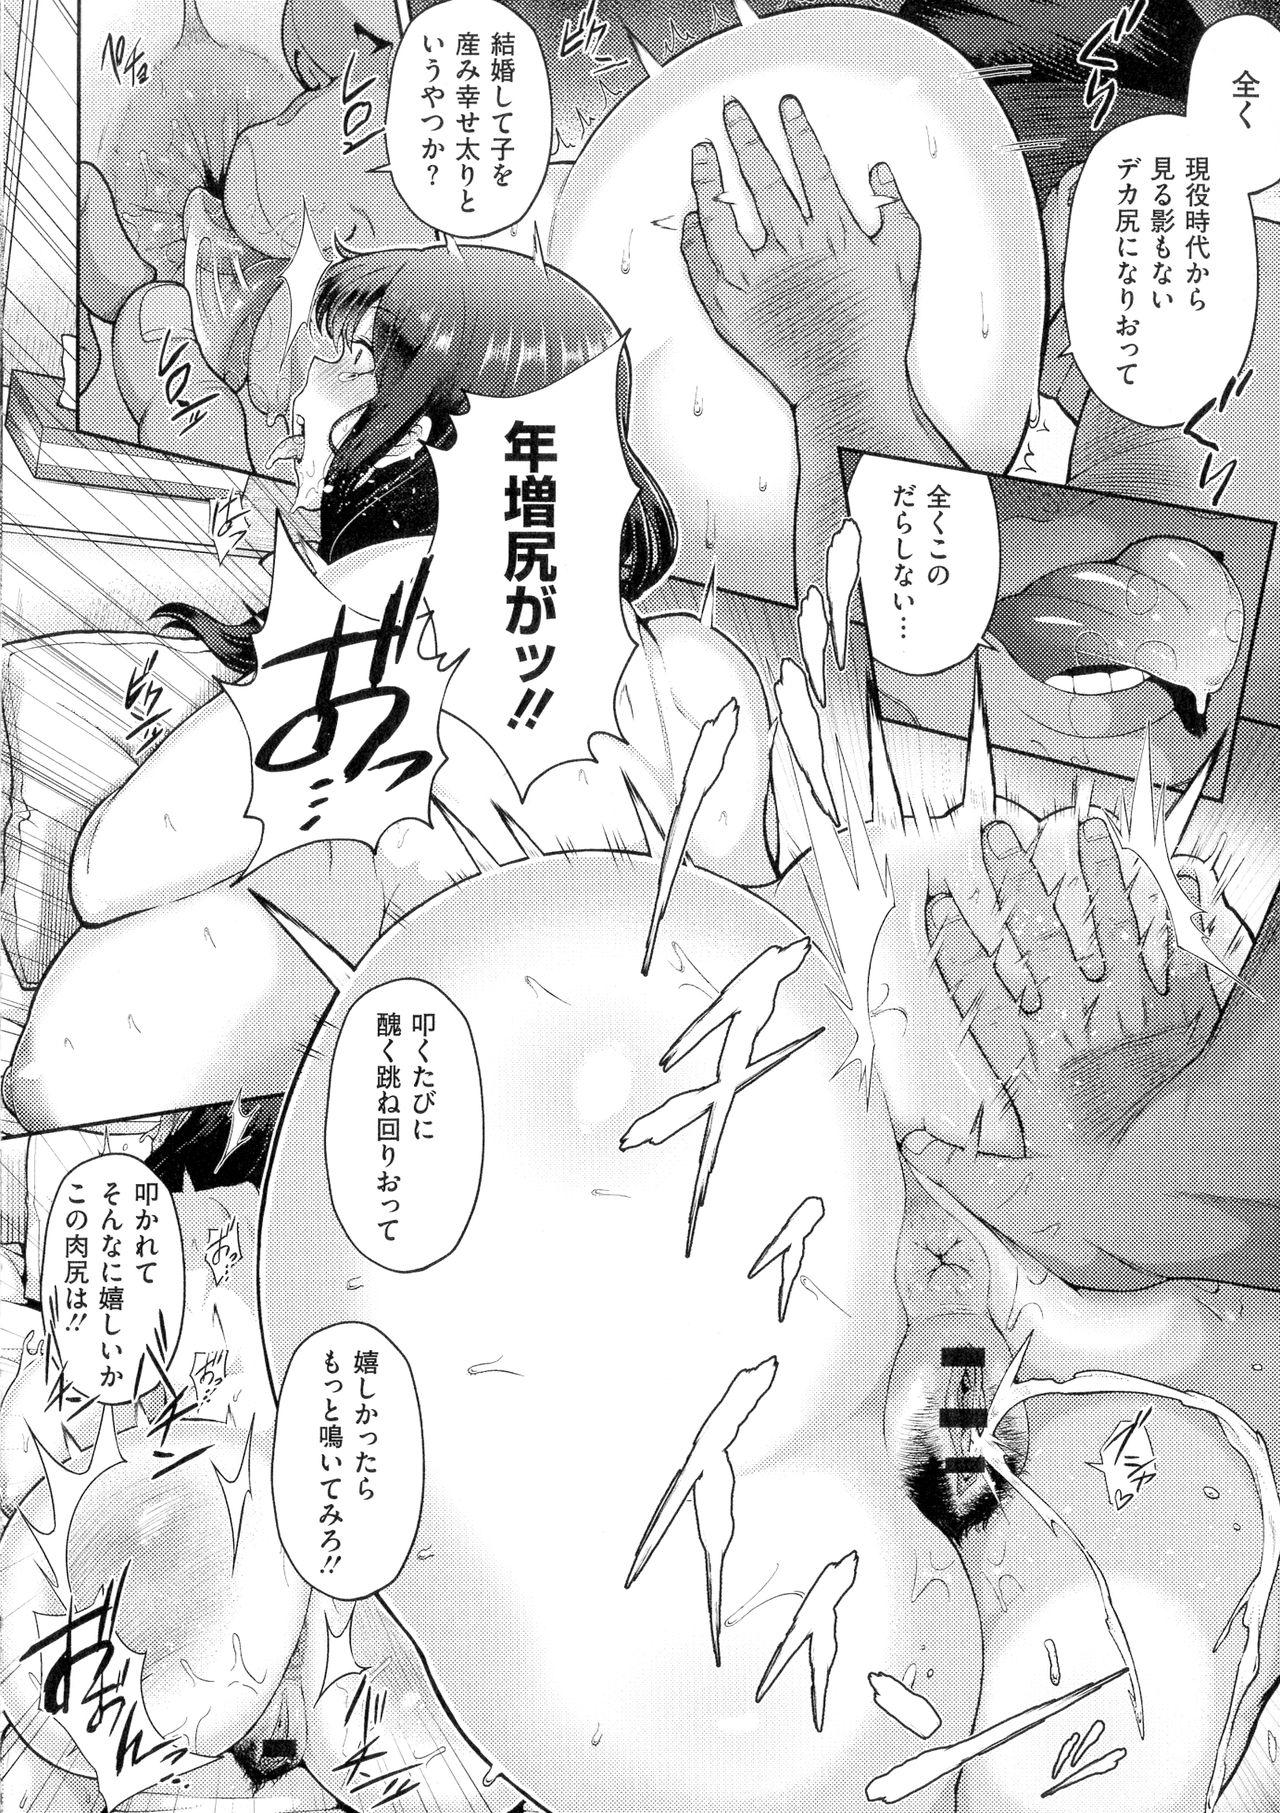 Juku Mesu - Erotic Mature Women 112